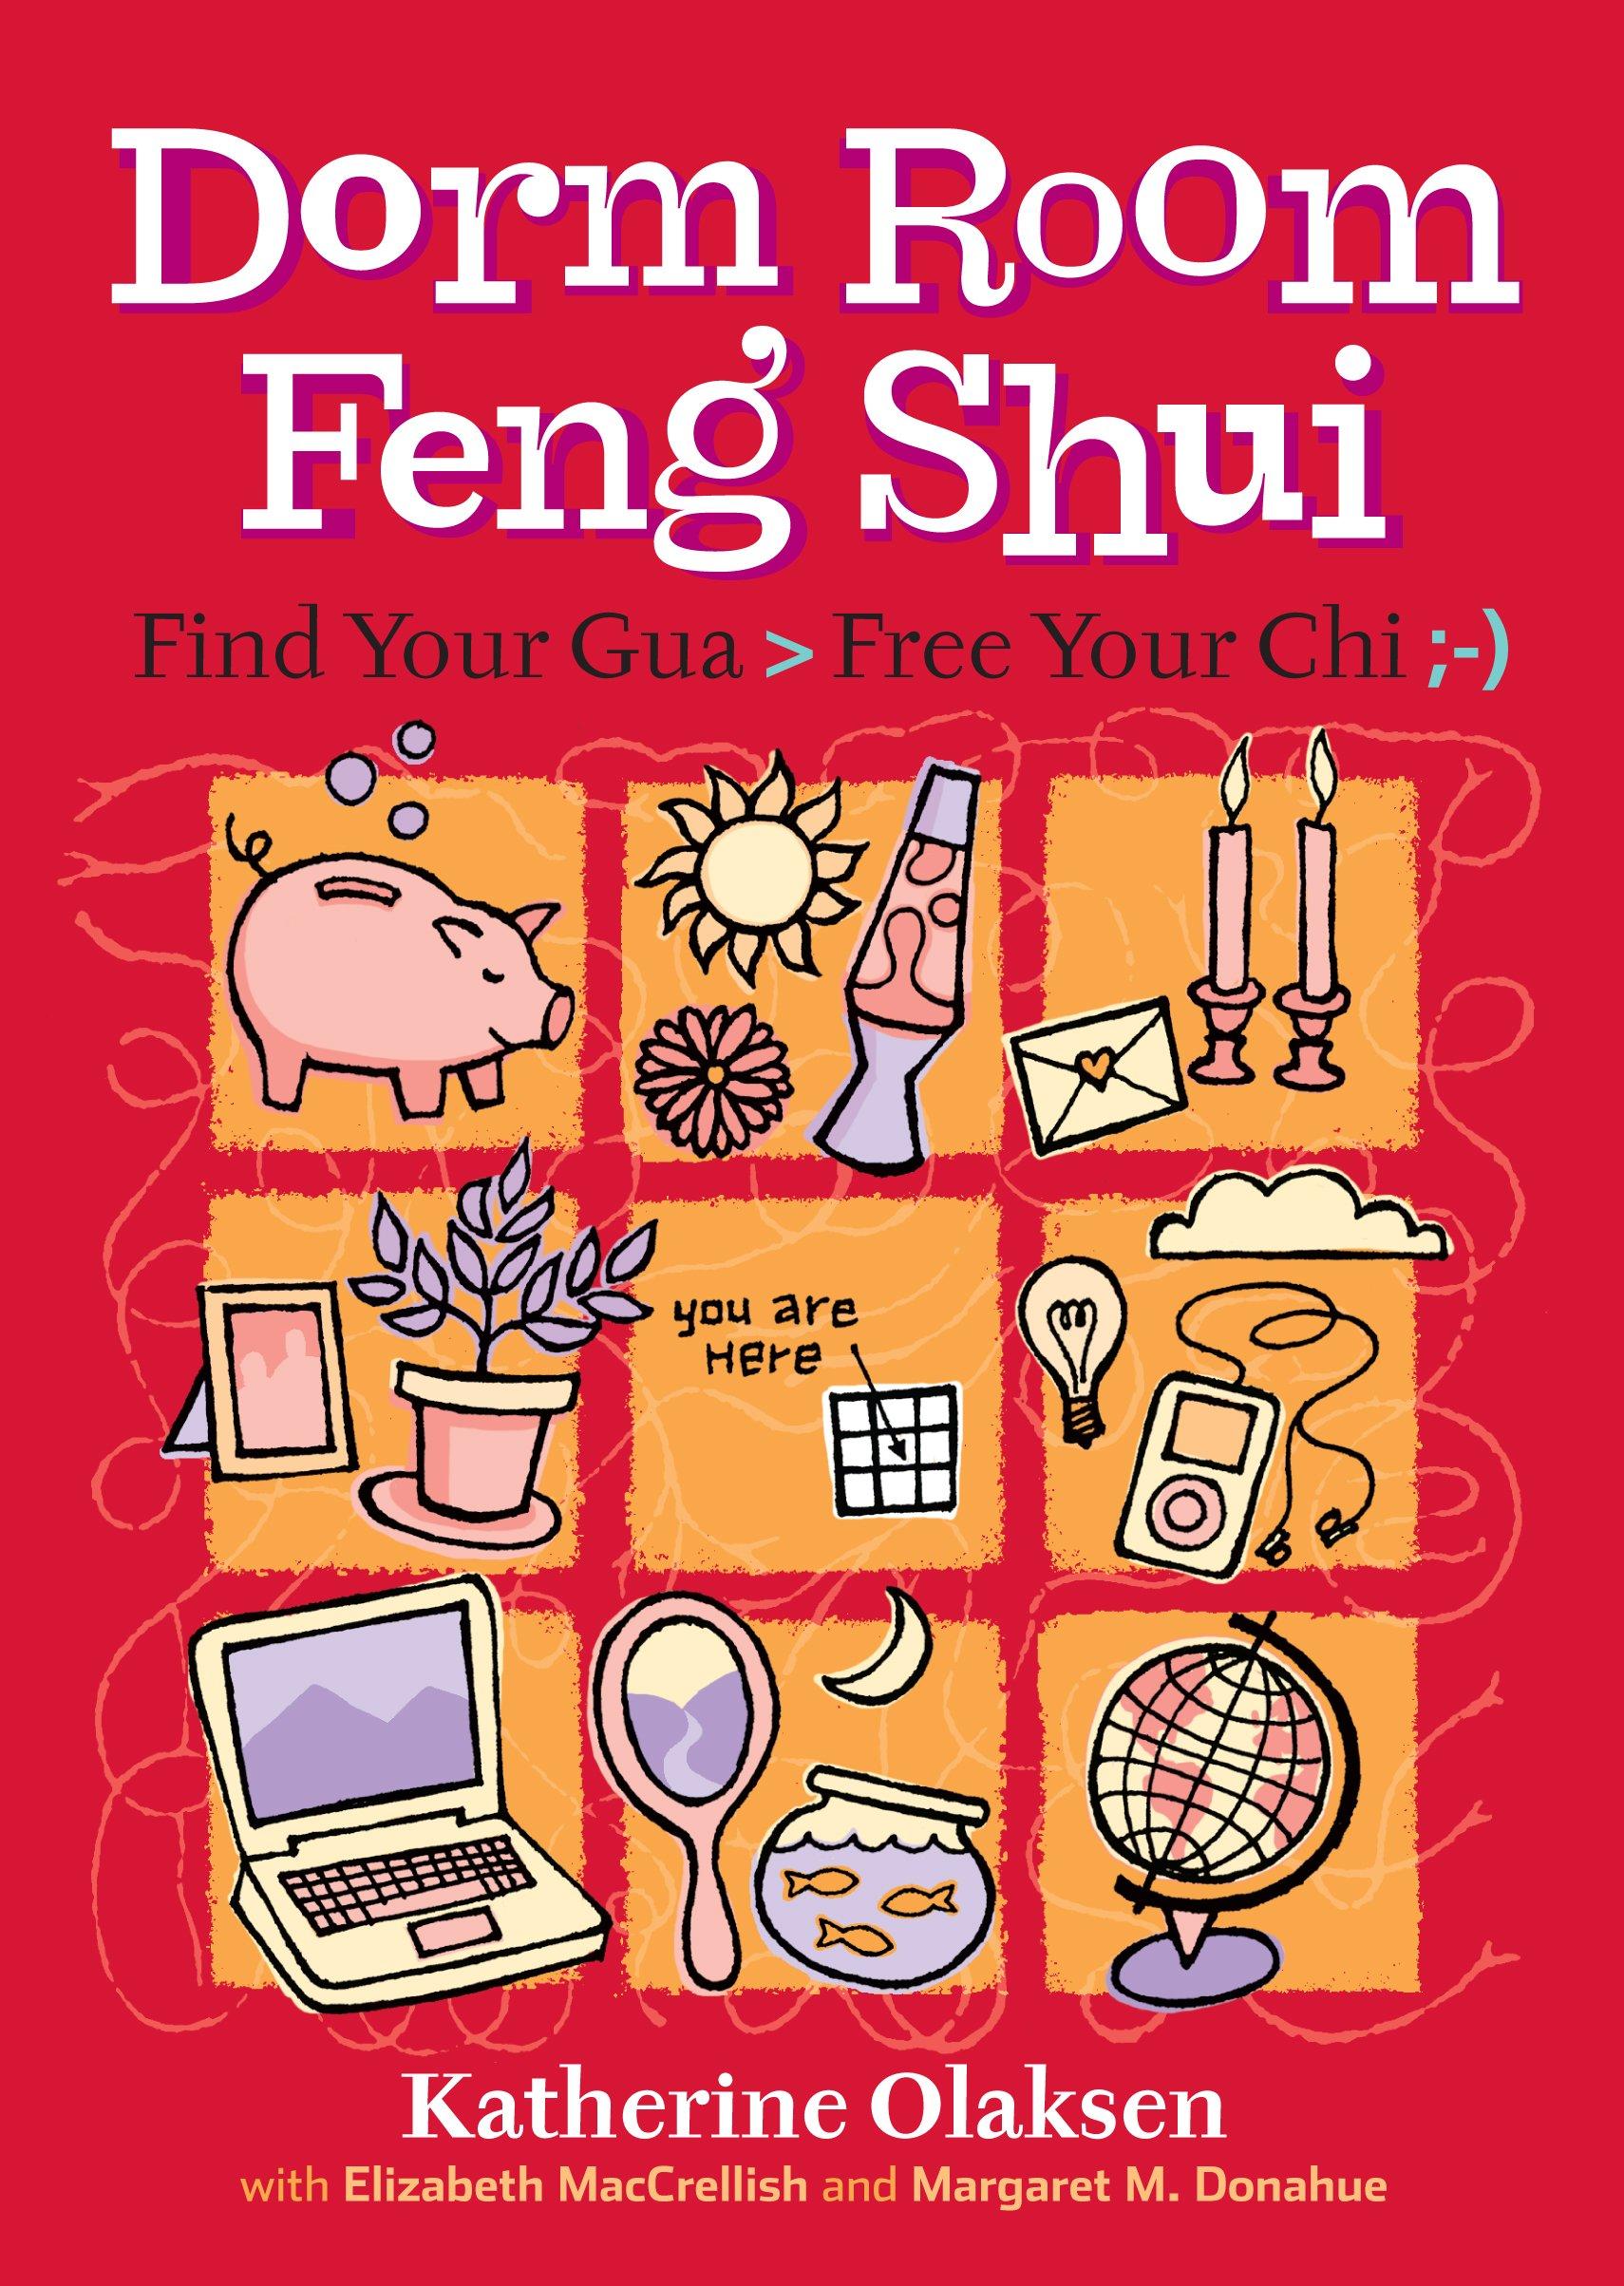 Dorm Room Feng Shui: Find Your Gua U003e Free Your Chi ; ): Margaret M.  Donahue, Elizabeth MacCrellish, Katherine Olaksen: 0037038175929:  Amazon.com: Books Part 17